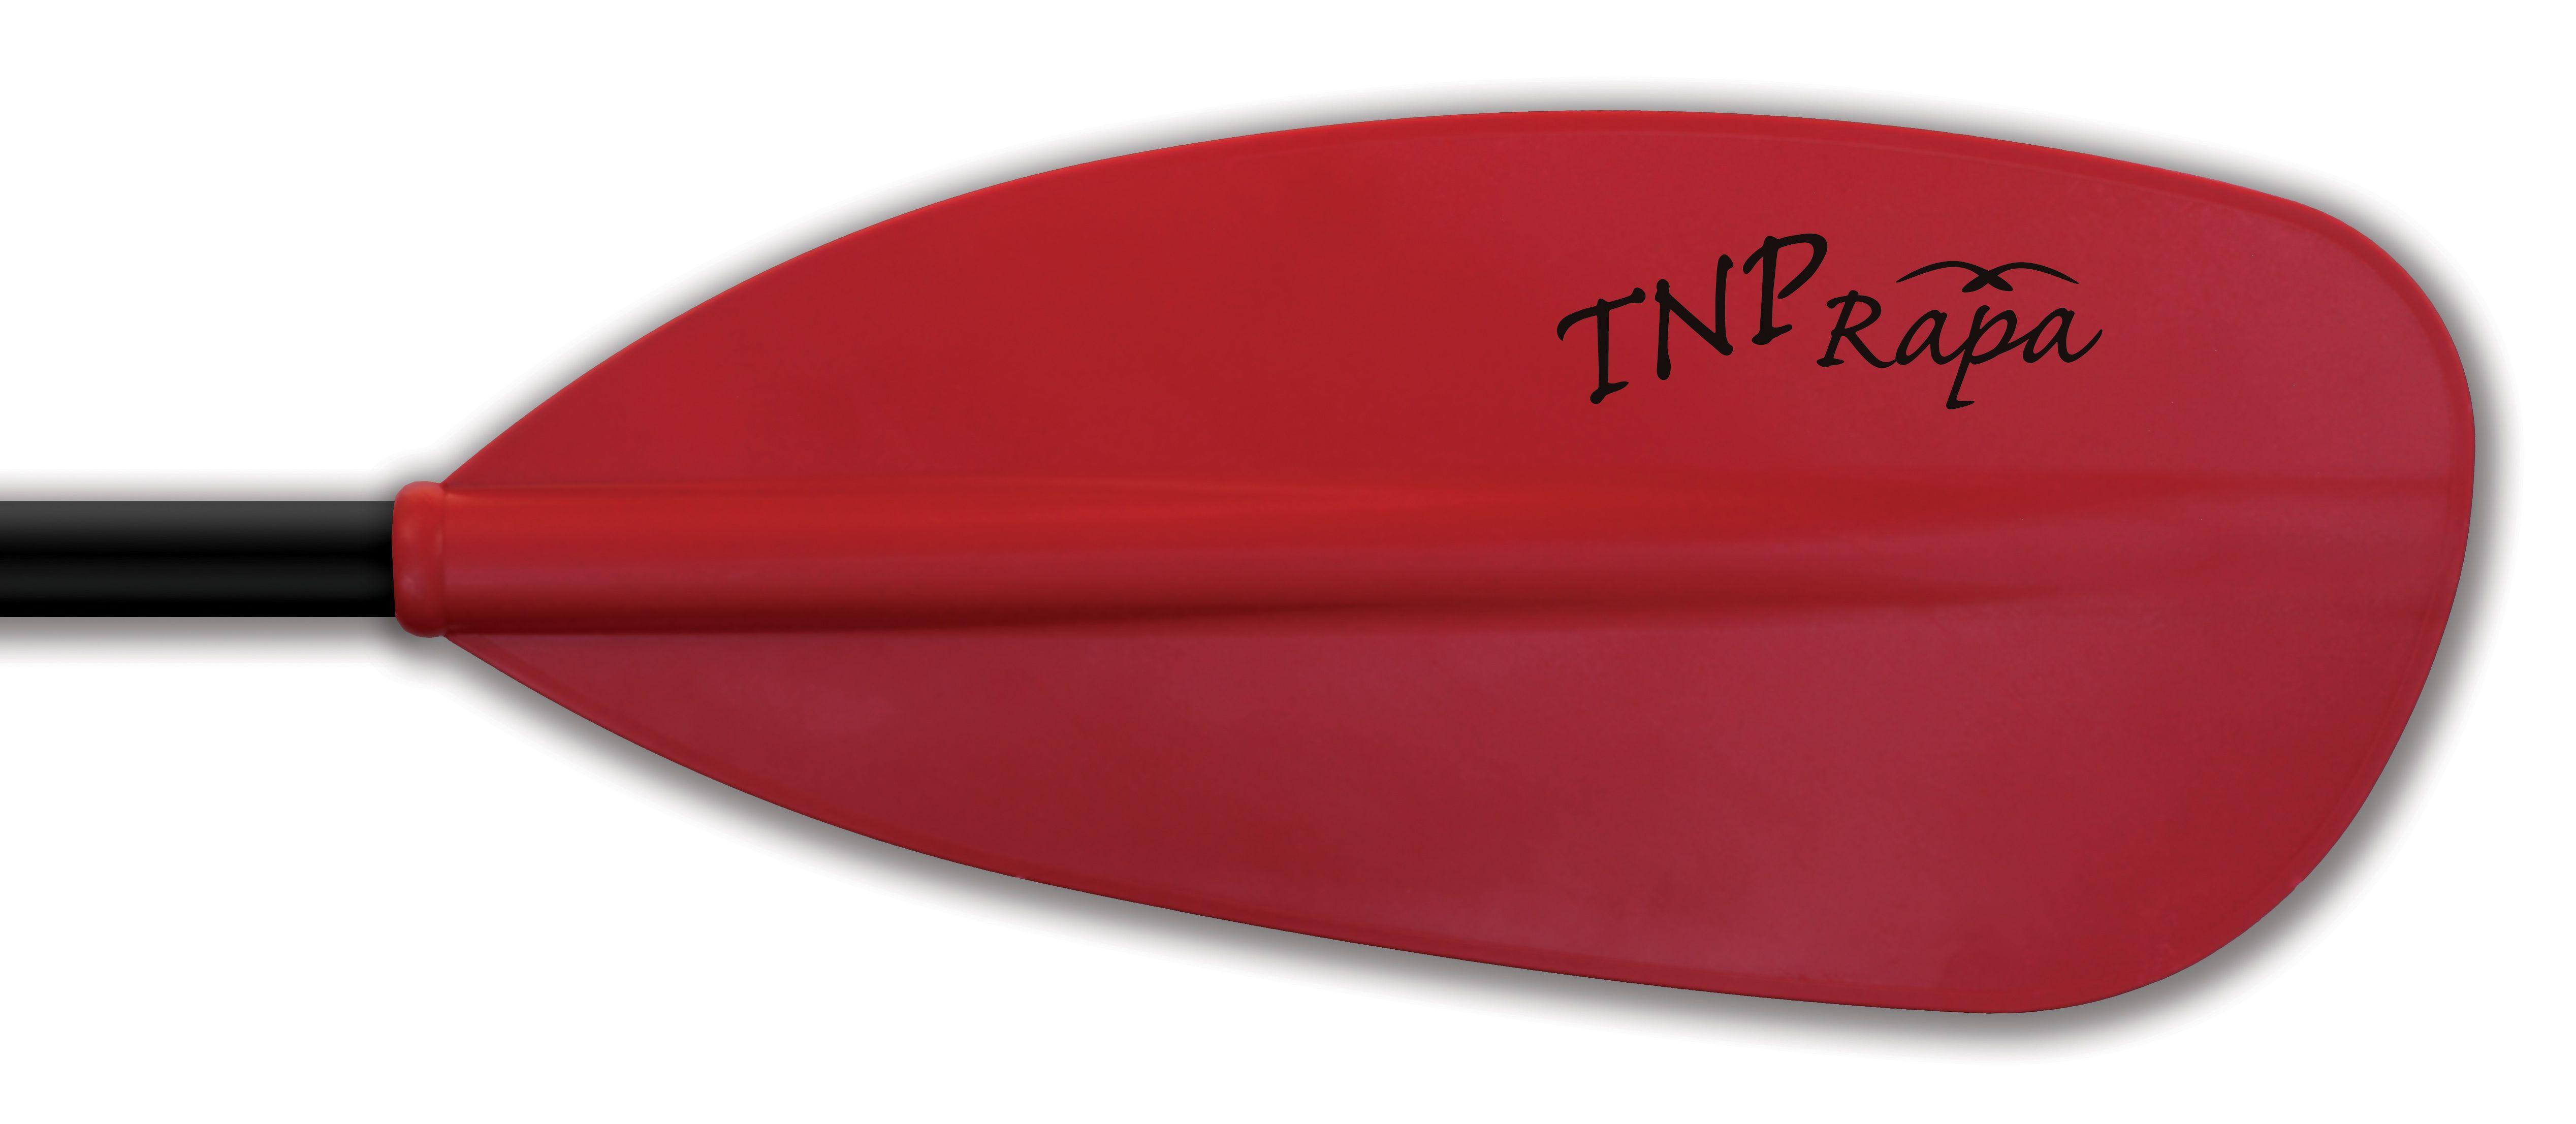 tnp-rapa-list